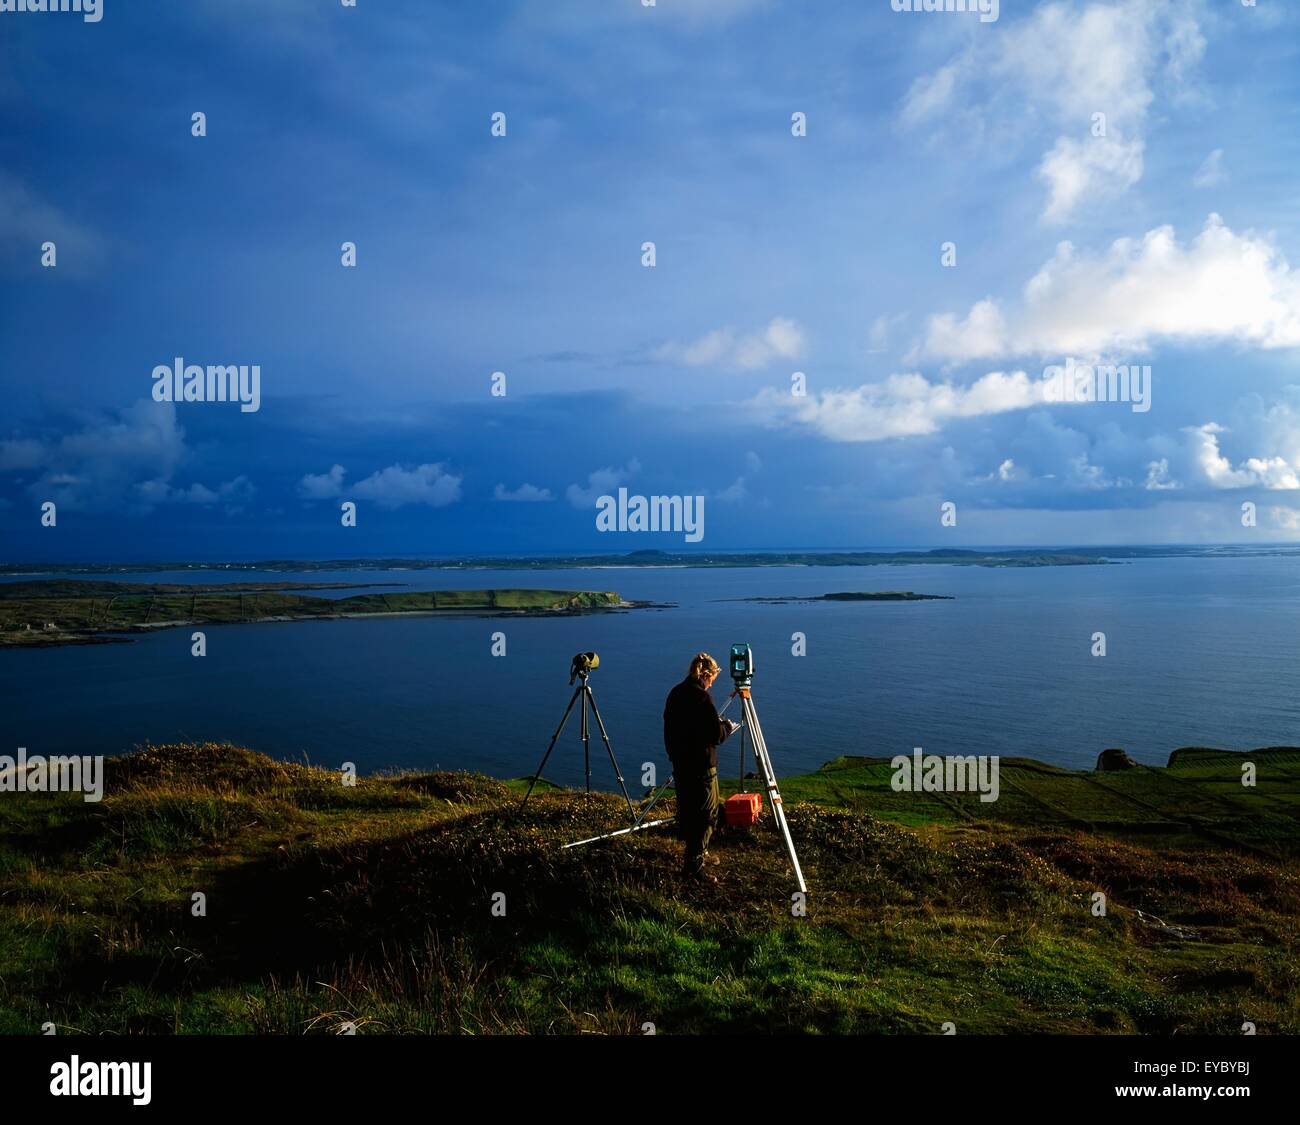 Surveying For Mapmaking, Sky Road, Connemara, Co Galway, Ireland - Stock Image